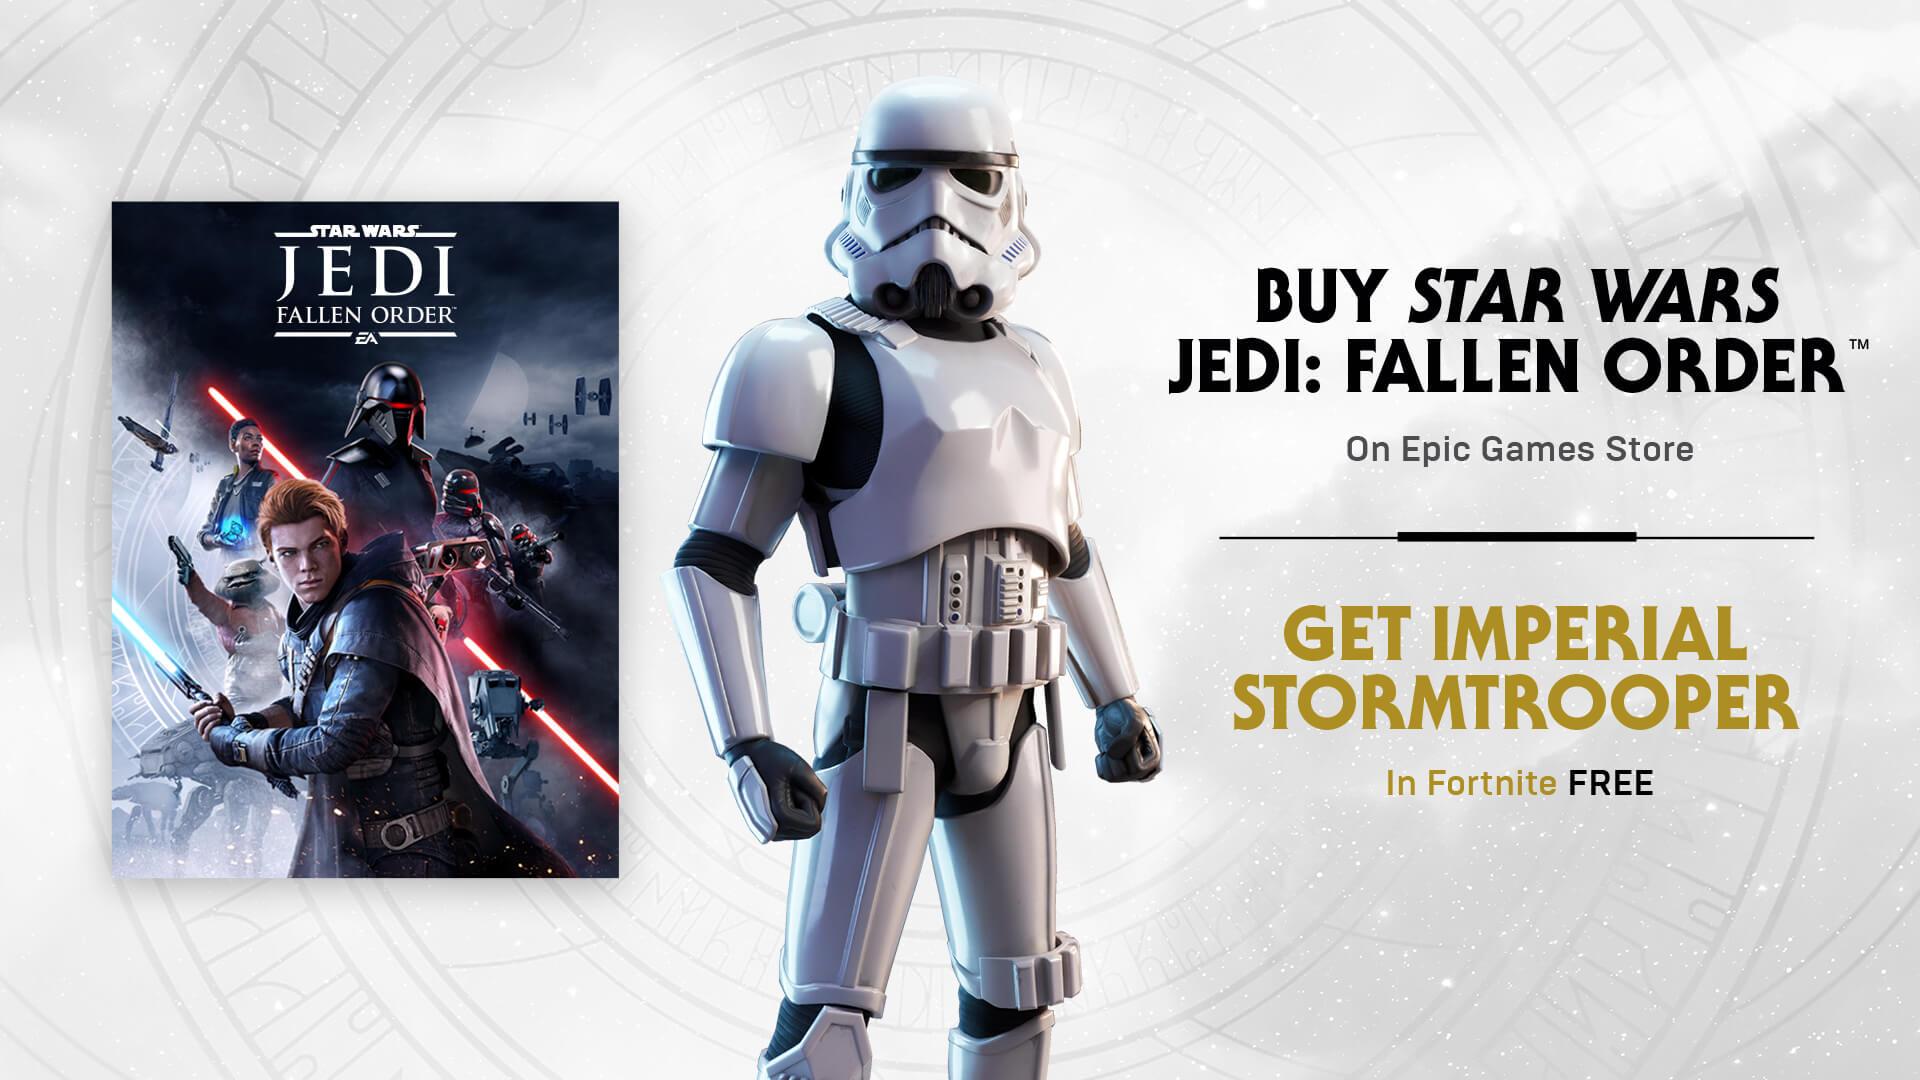 Star Wars Jedi Fallen Order - Standard Edition